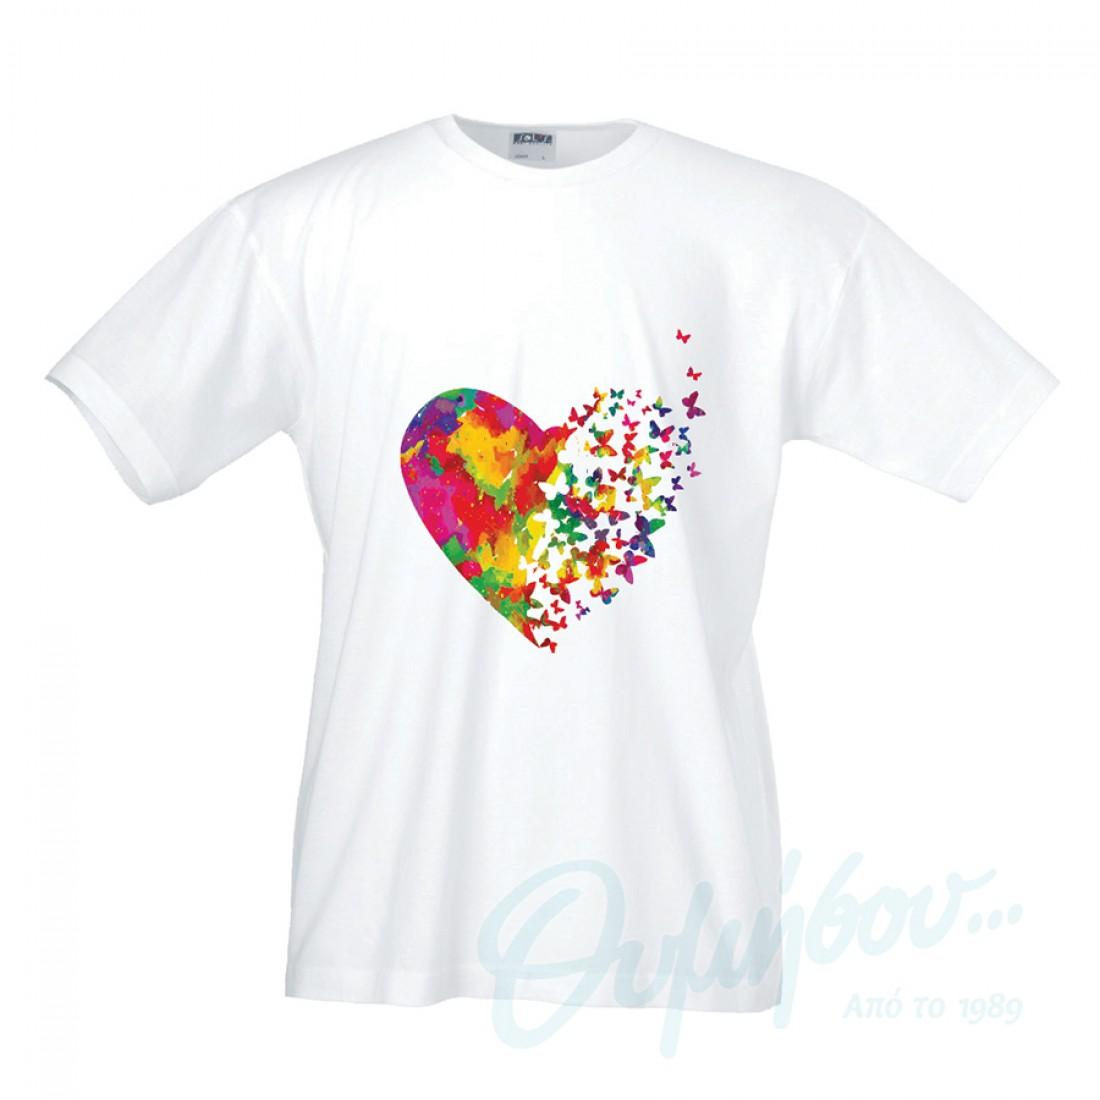 1825506997bc Λευκό μπλουζάκι με ψηφιακή εκτύπωση thimisou.gr